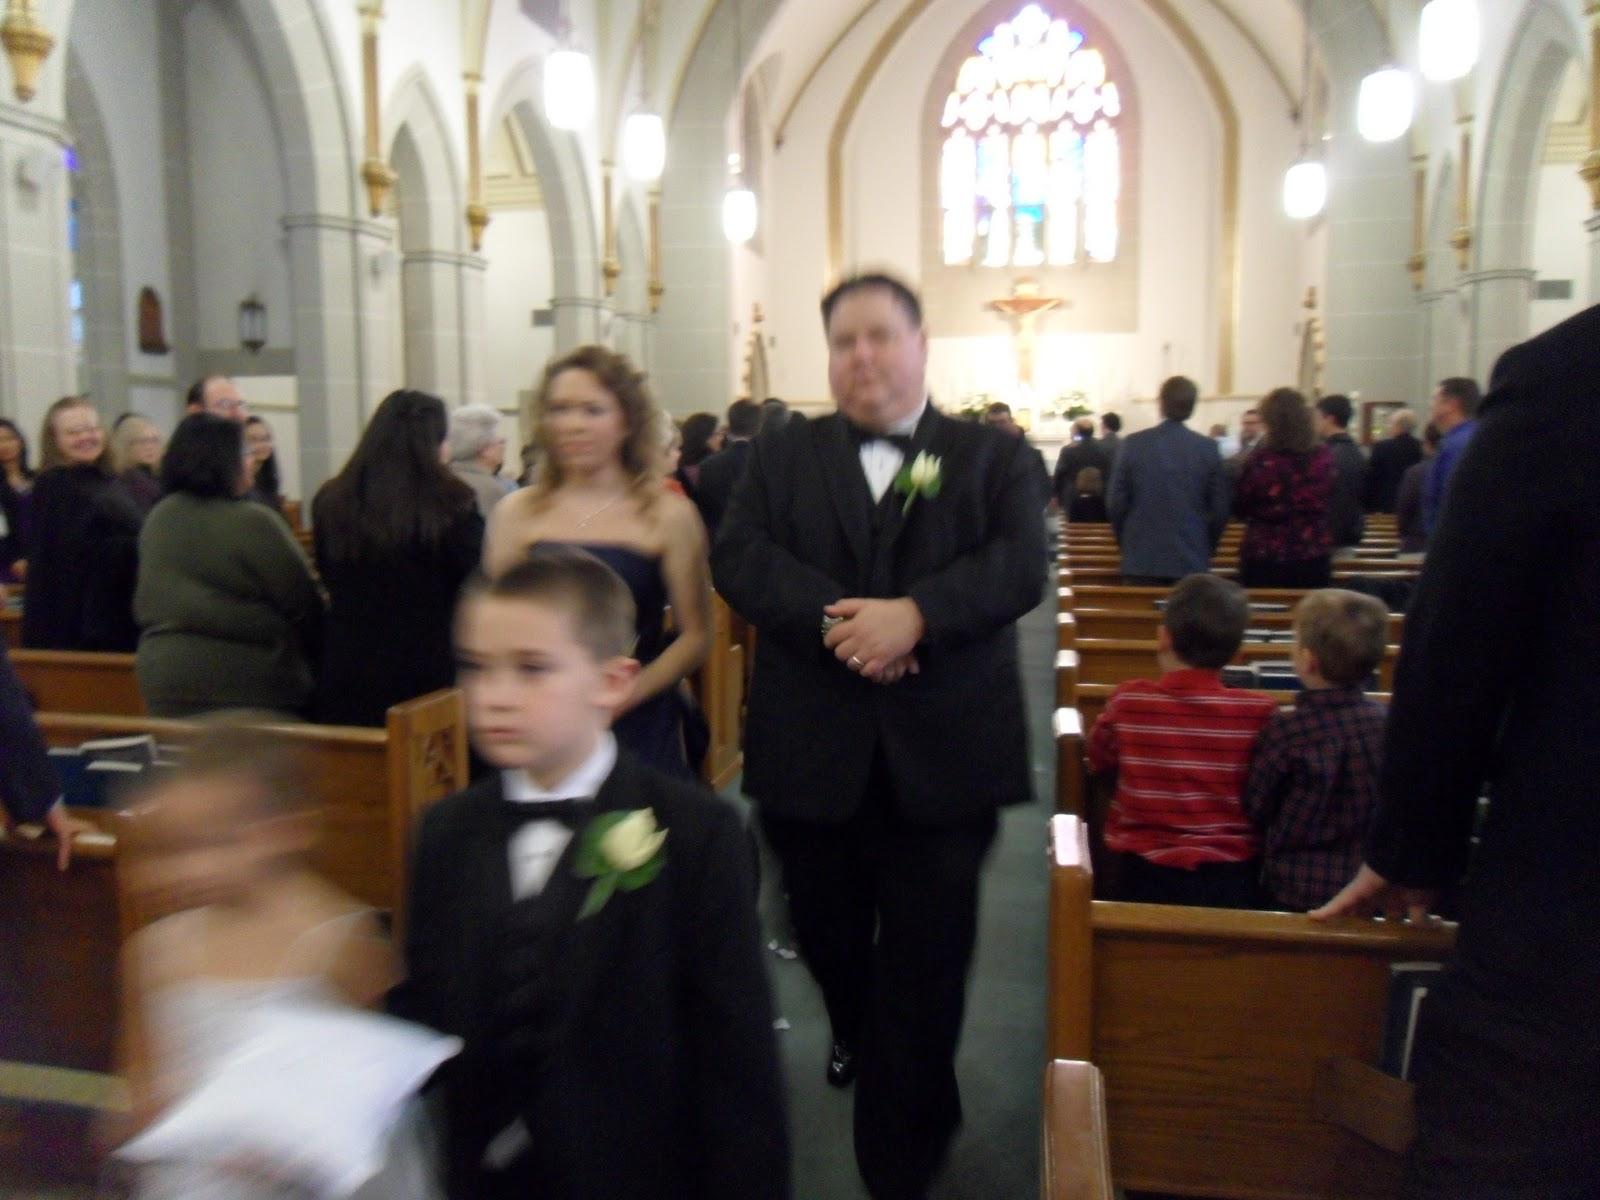 Our Wedding, photos by Rachel Perez - SAM_0168.JPG